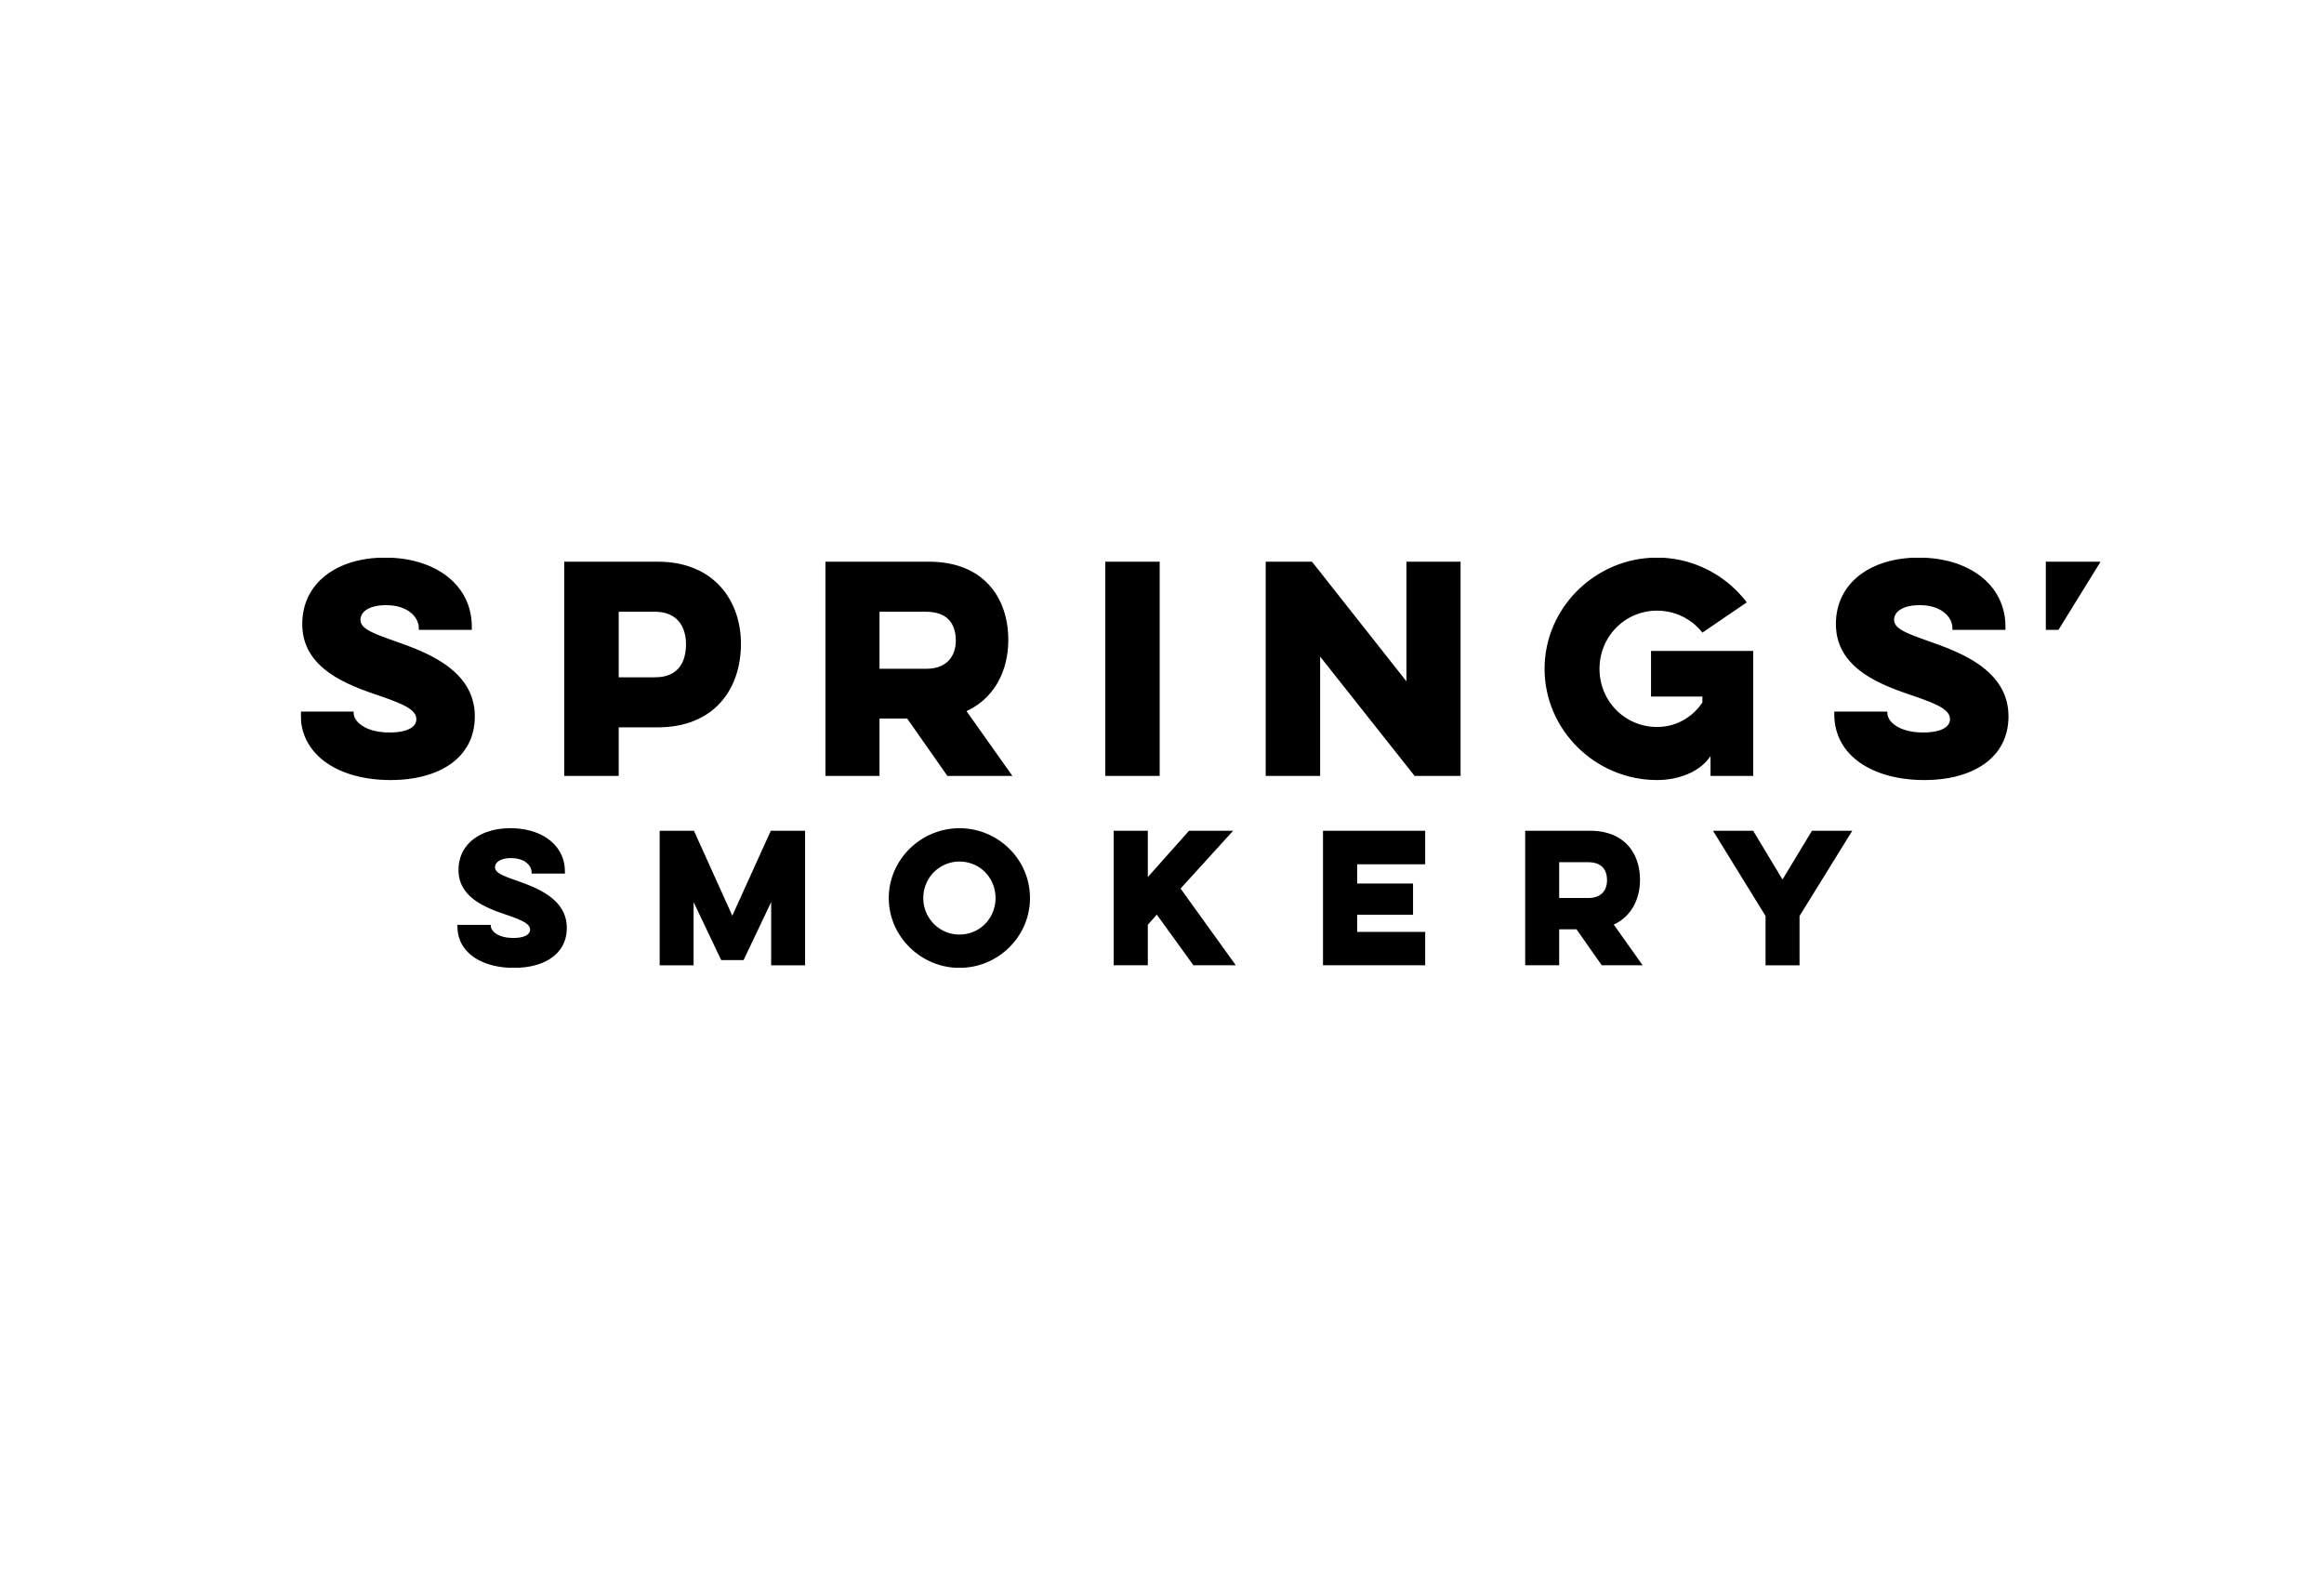 Wordmark design for Springs' Smokery.